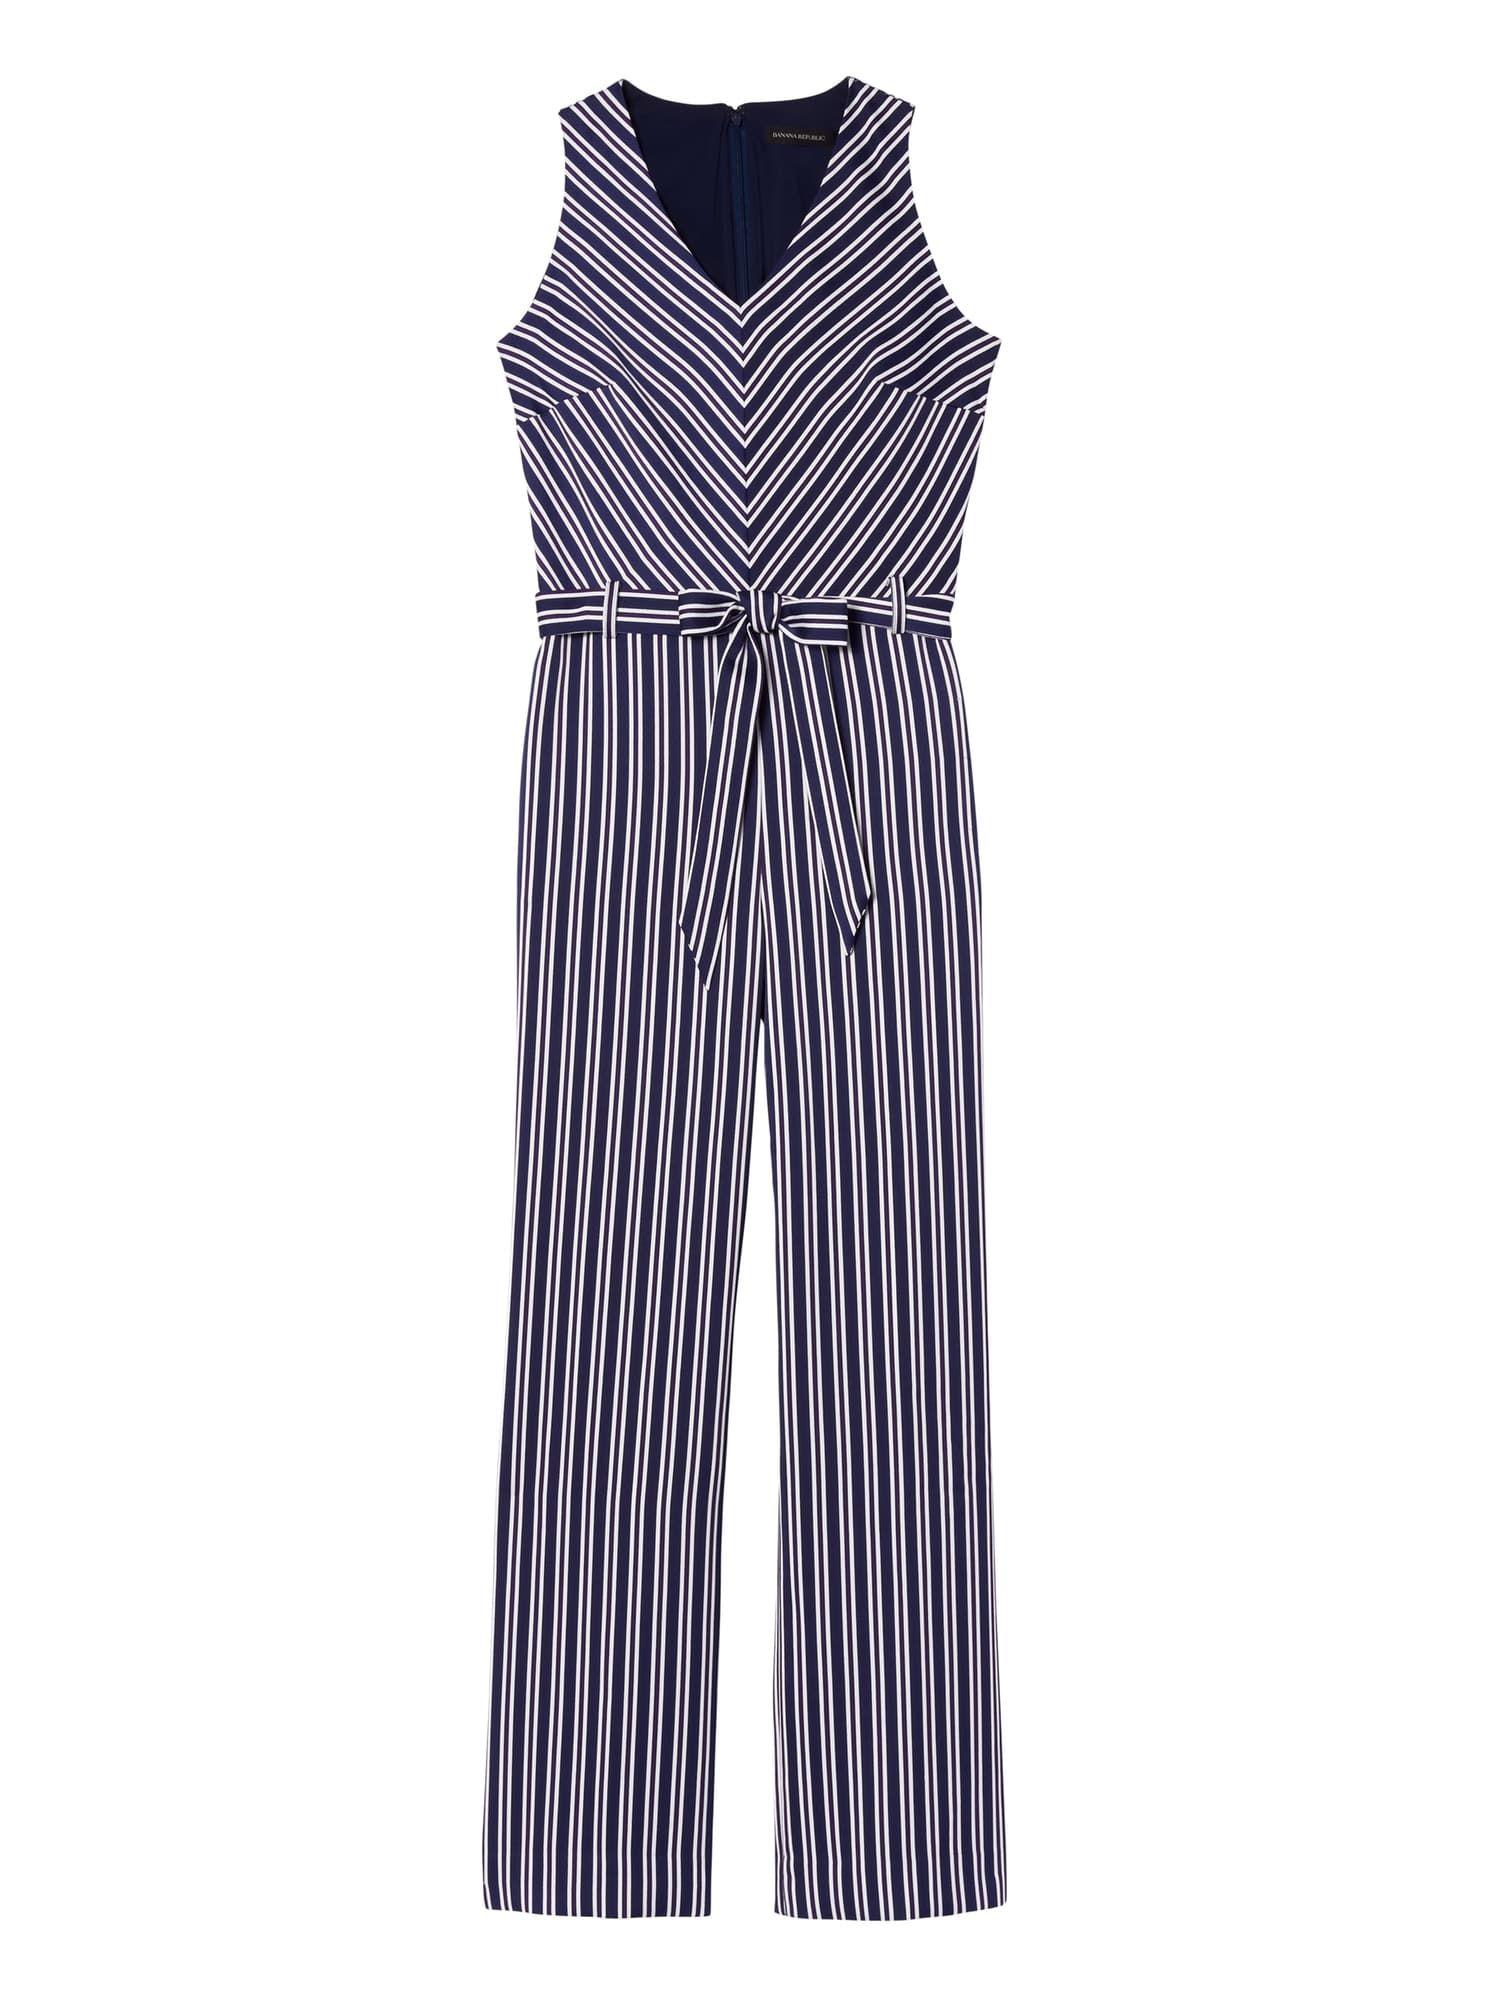 43cd3707a68 Stripe Tie-Waist Jumpsuit